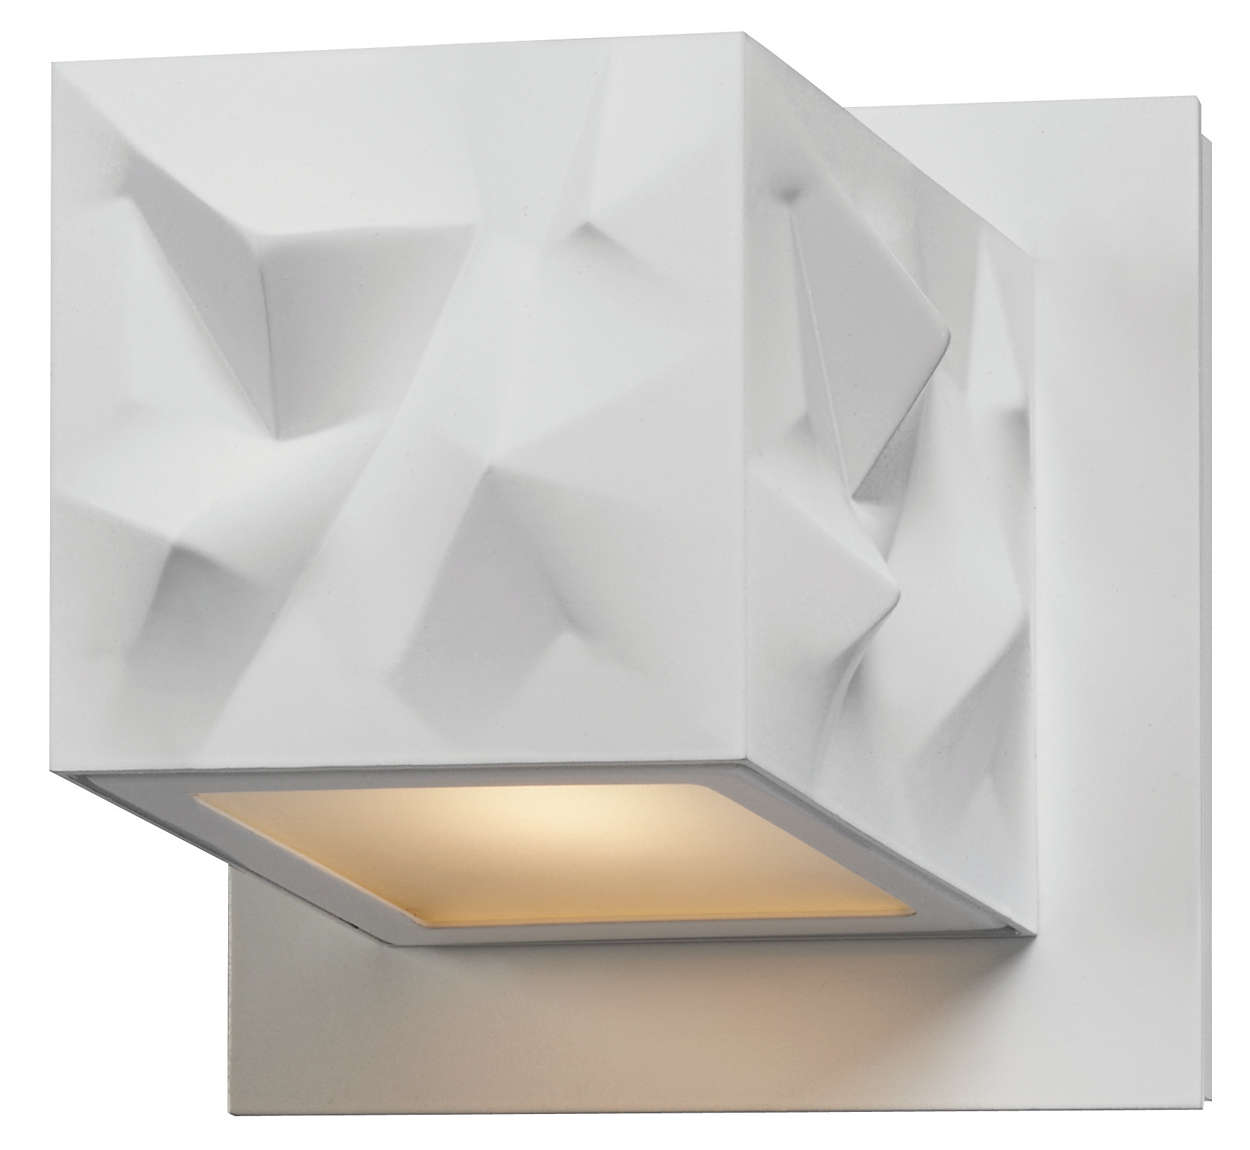 Alps LED wall light